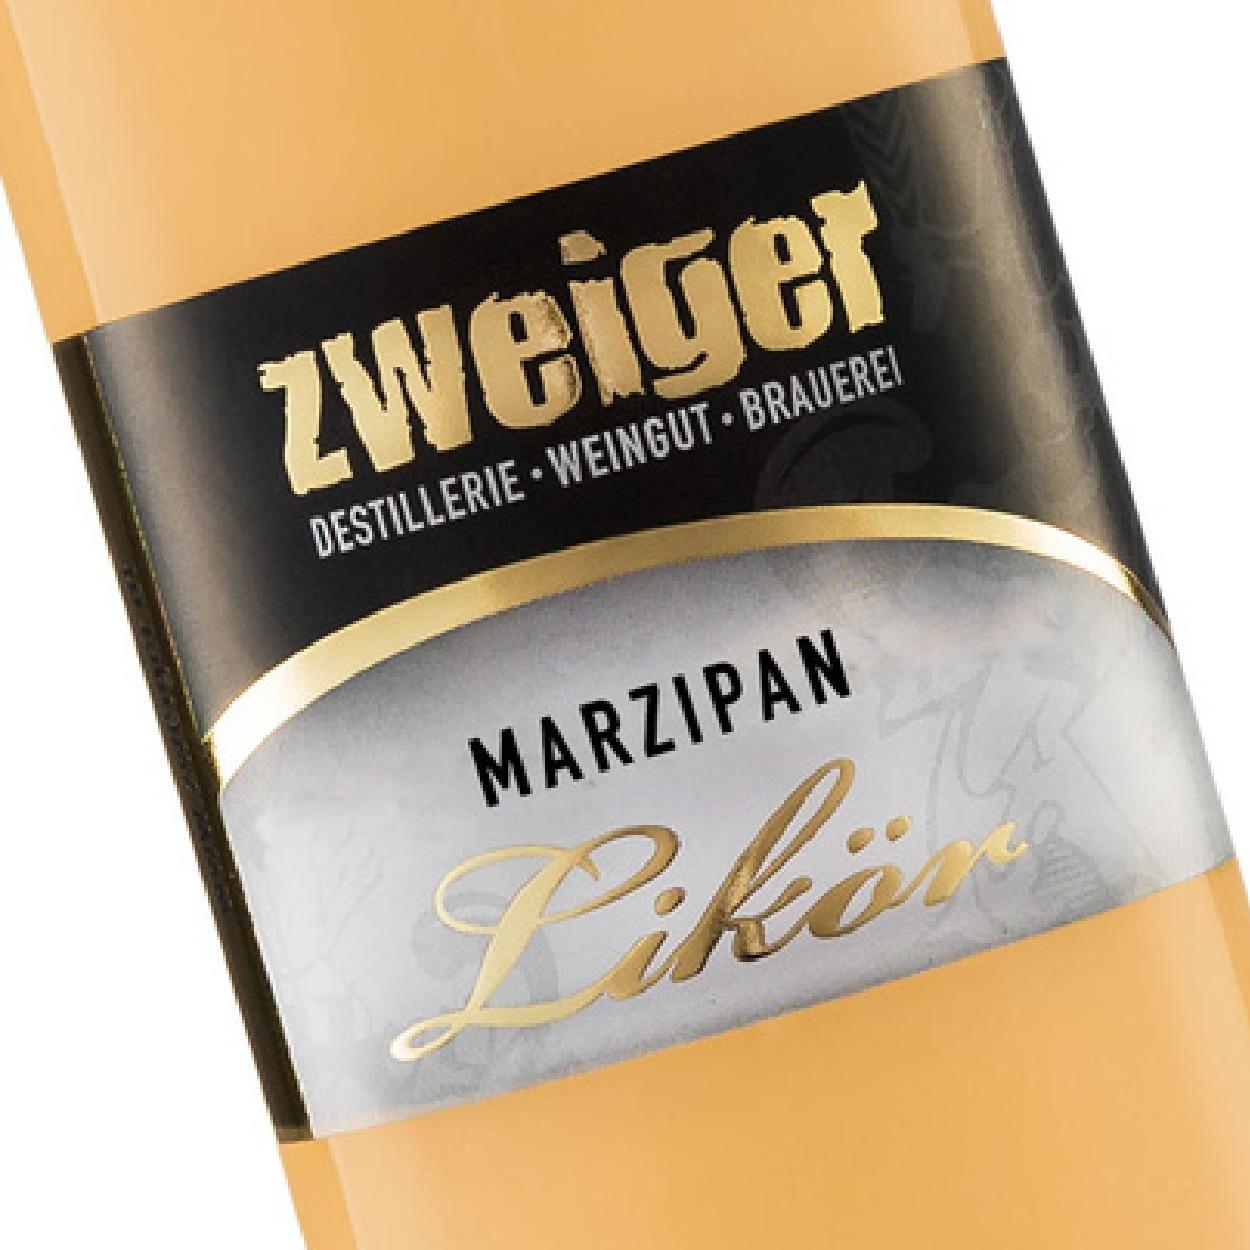 Marzipan Cremelikör Zweiger Destillerie